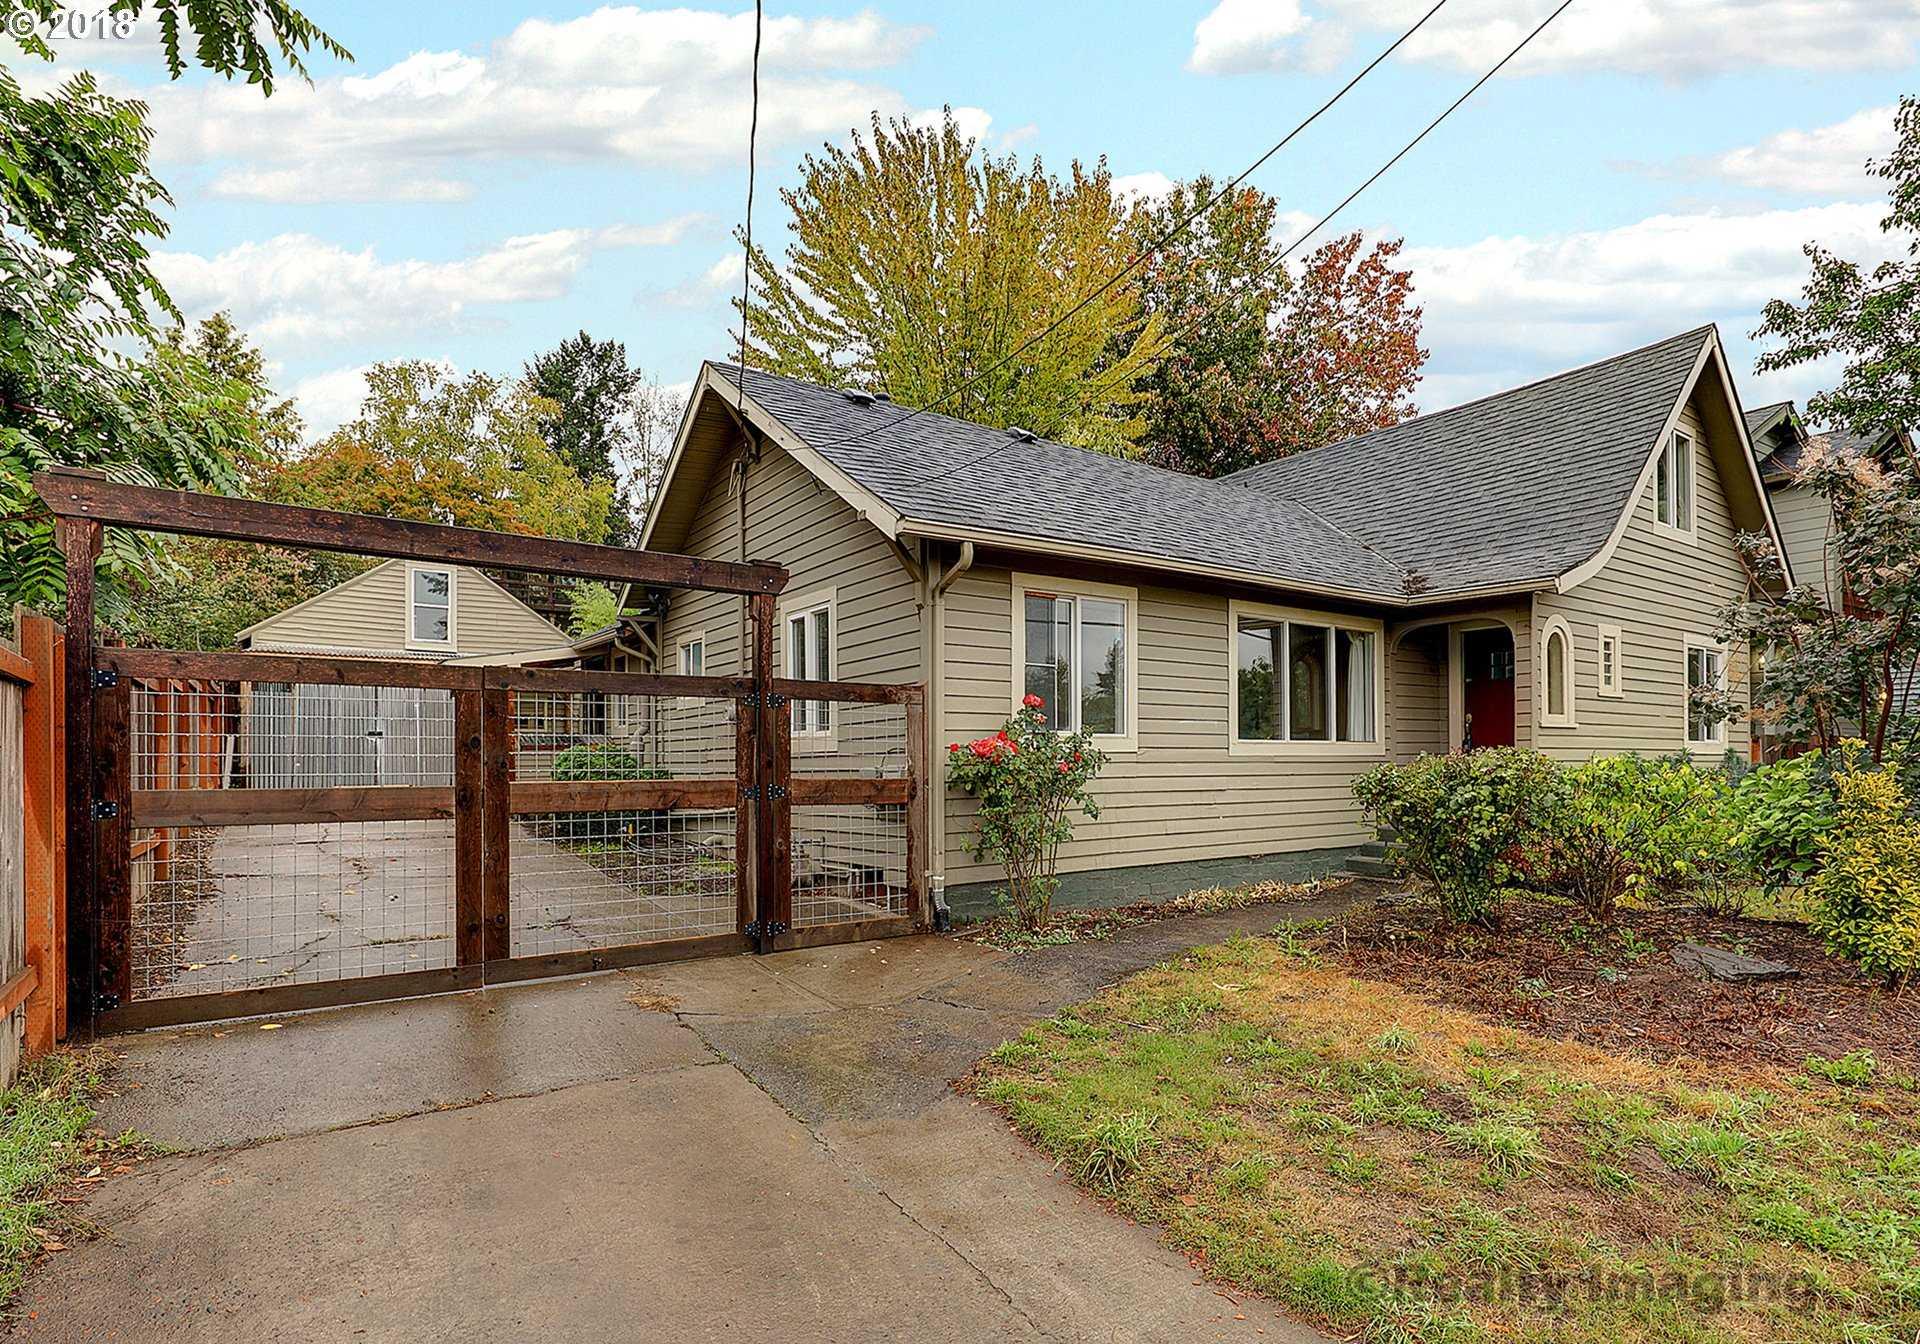 $499,000 - 4Br/3Ba -  for Sale in Eastmoreland Heights/woodstock, Portland